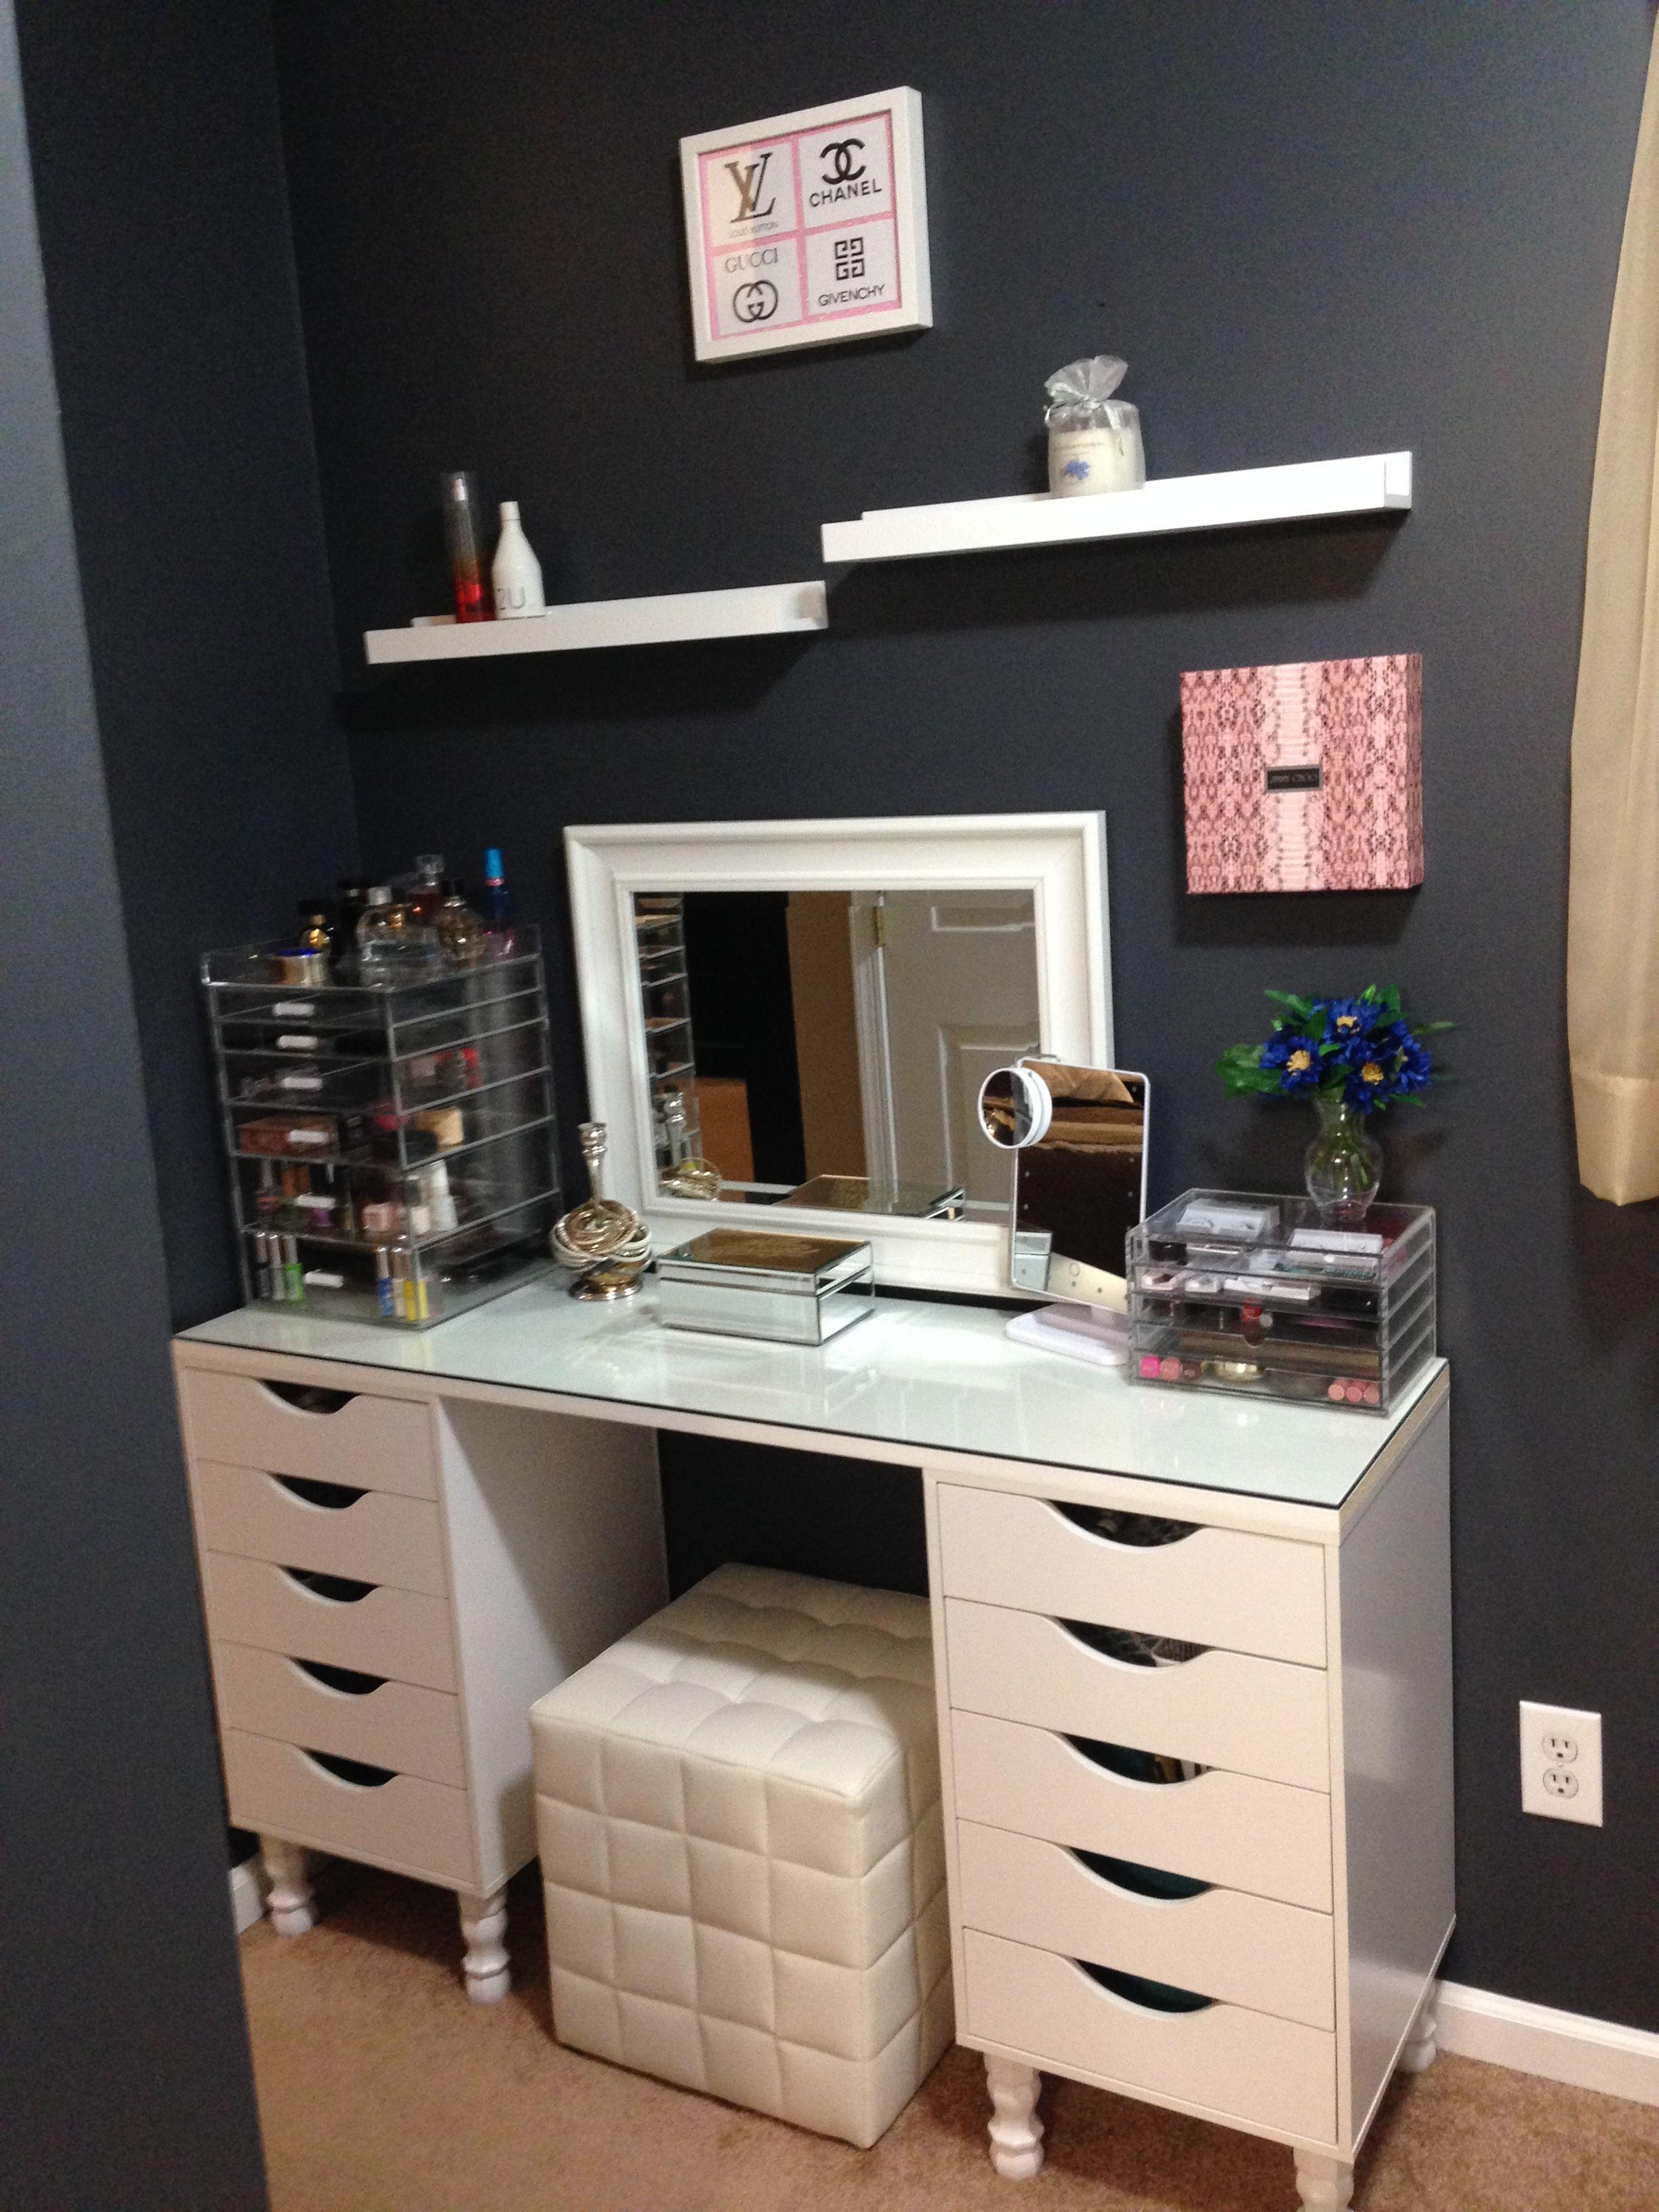 prodigious Ikea Vanity Room Part - 9: DIY Vanity IKEA dupe